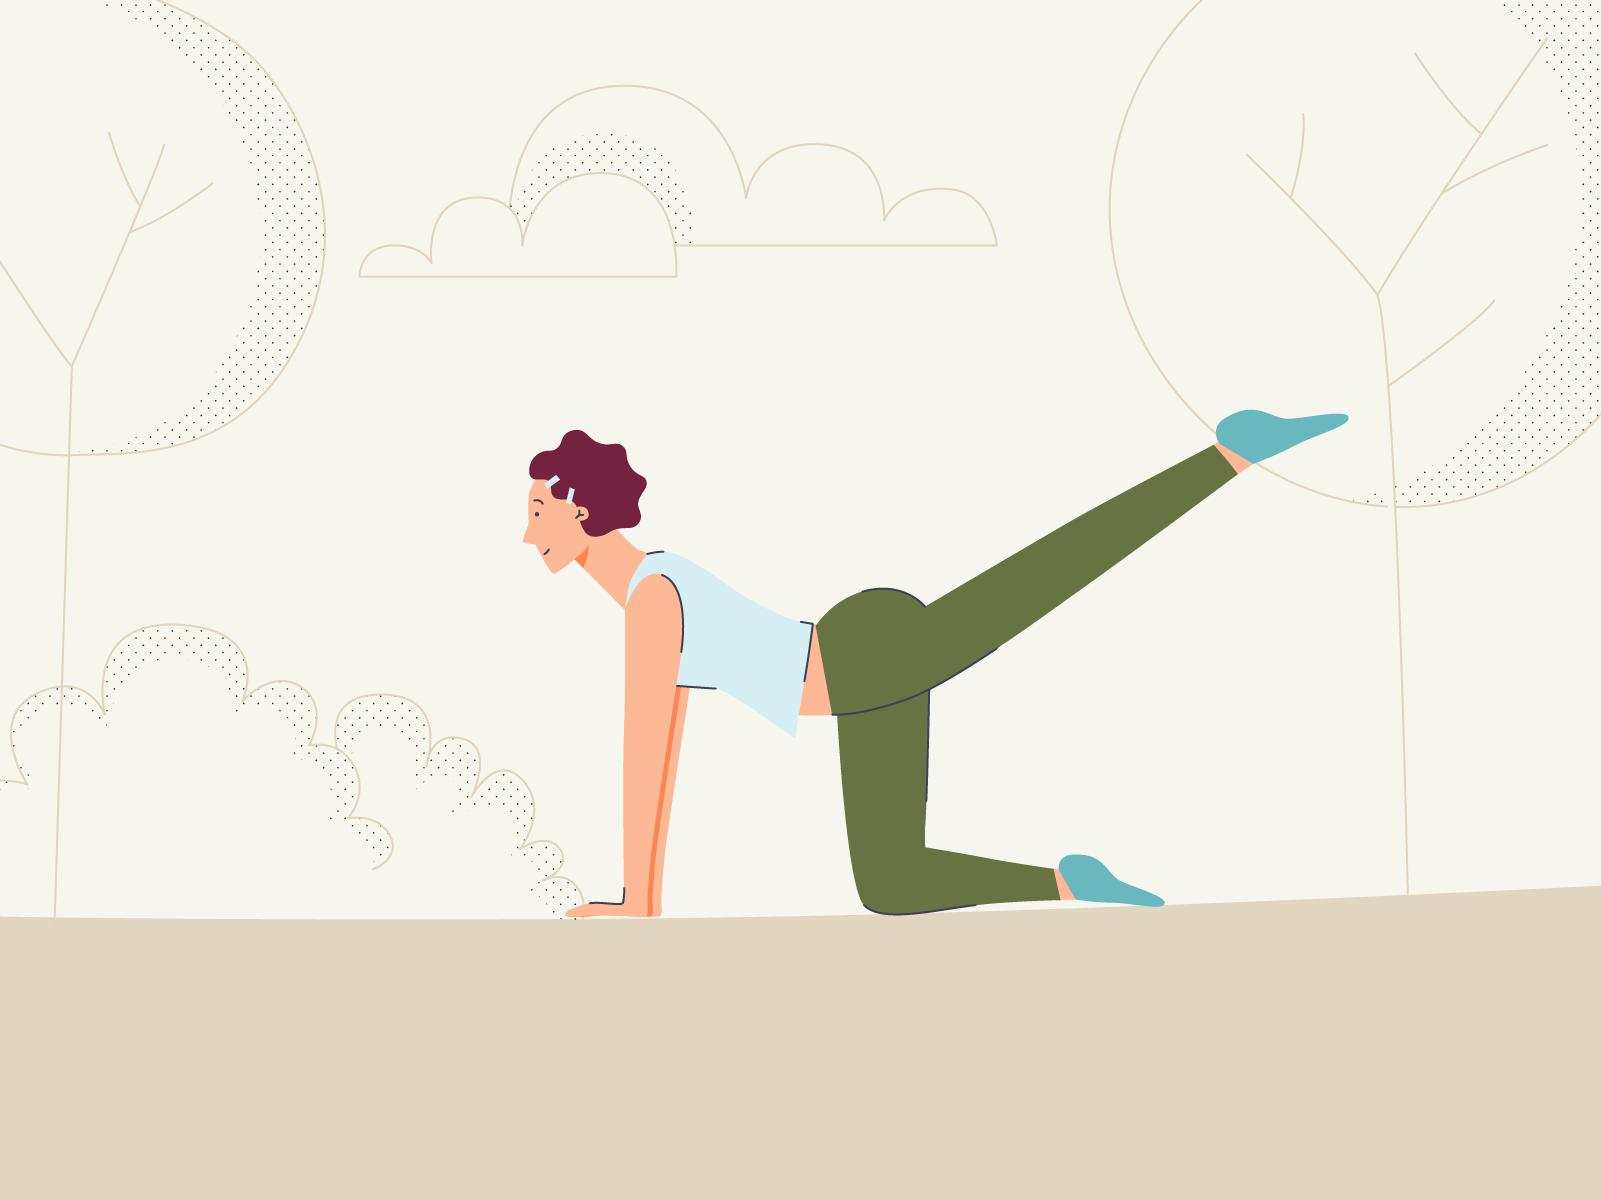 Yoga_Plan de travail 1 copie